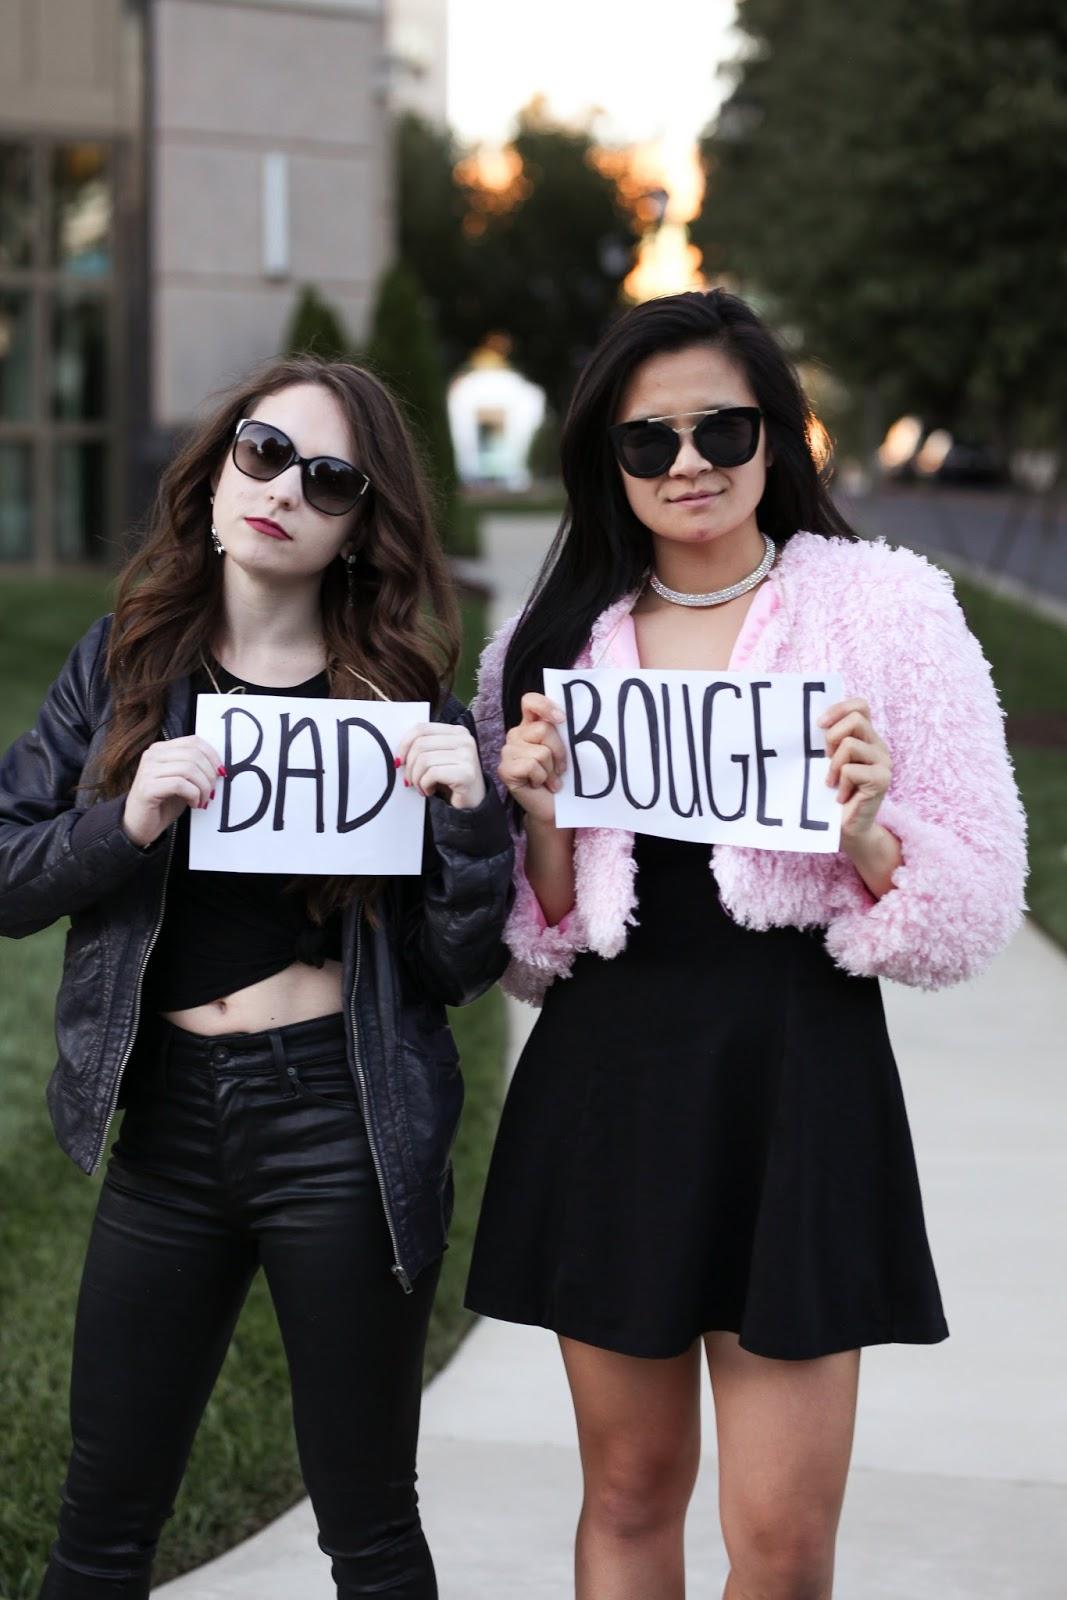 Partner halloween costume idea - bad and boujee - diy costume